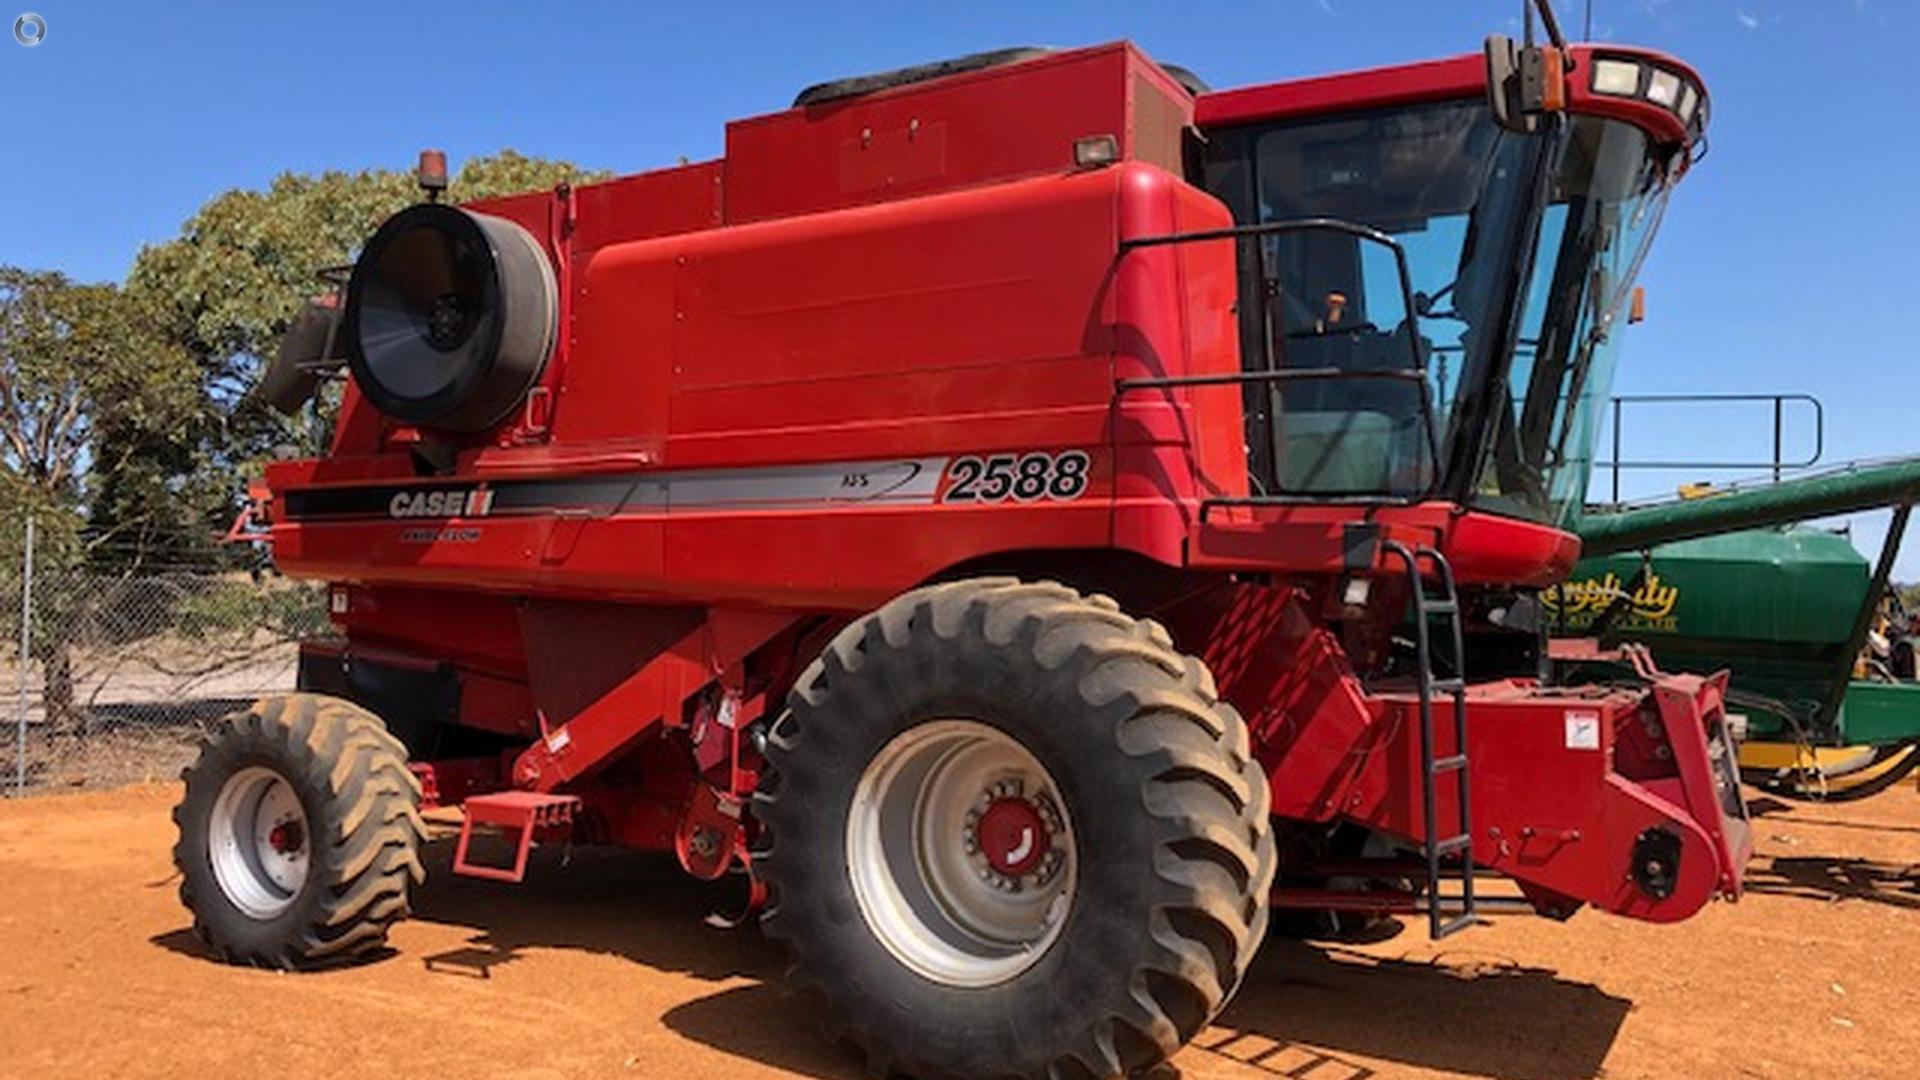 2004 CASE IH 2588 Combine Harvester